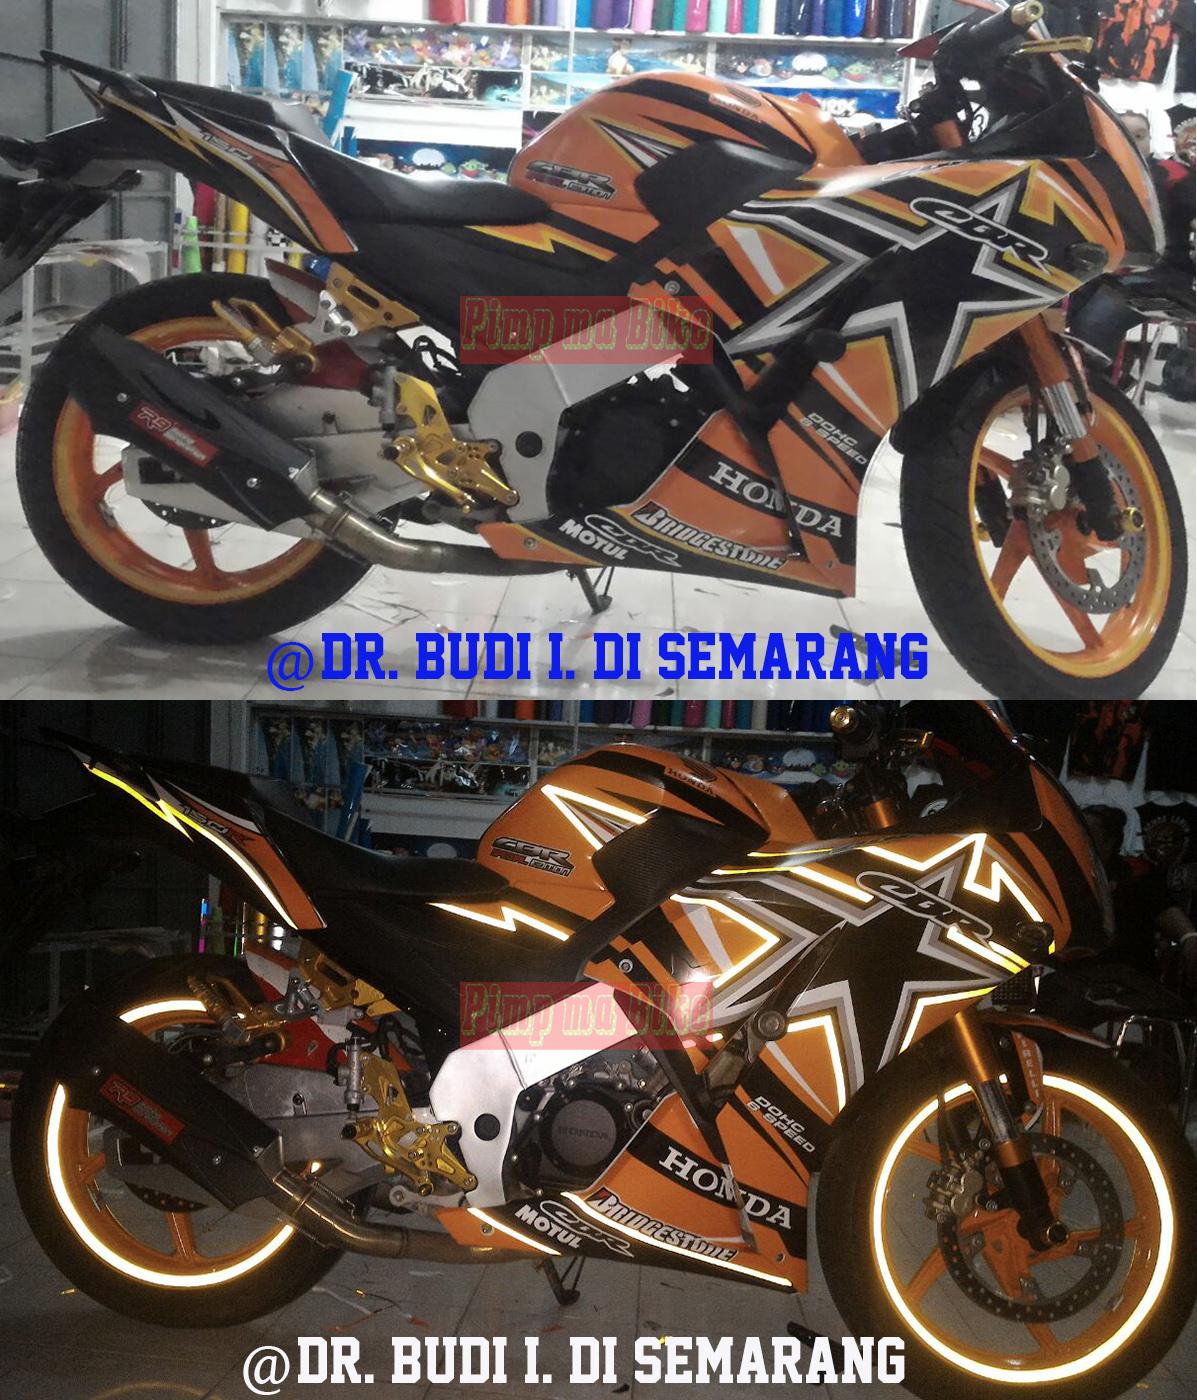 Kumpulan Variasi Motor Semarang Terbaru Dan Terlengkap Modifikasi